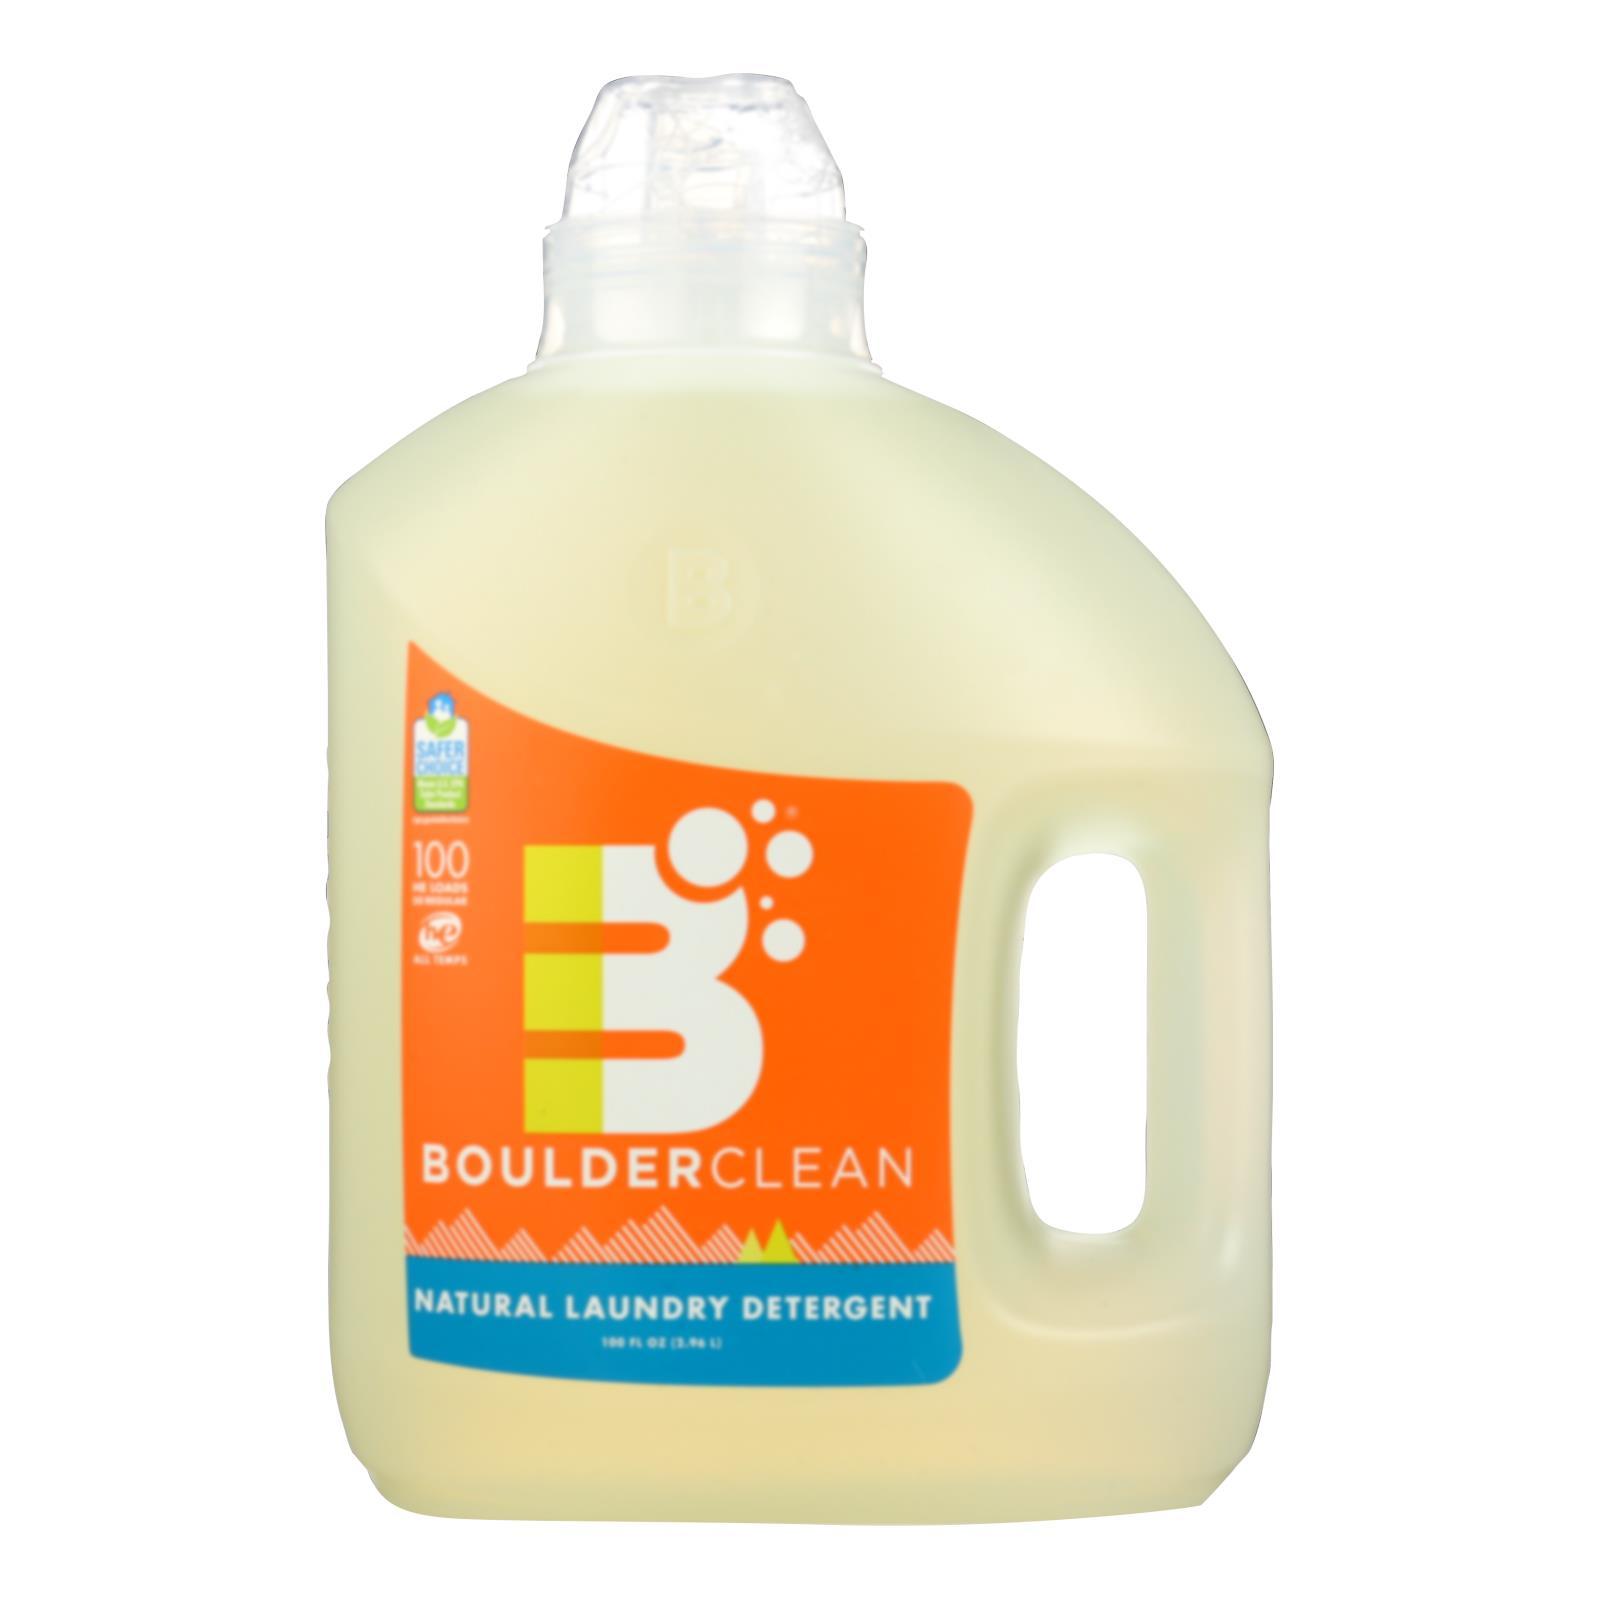 Boulder Clean - Liquid Laundry Detergent - Valencia Orange - Case of 4 - 100 fl oz.